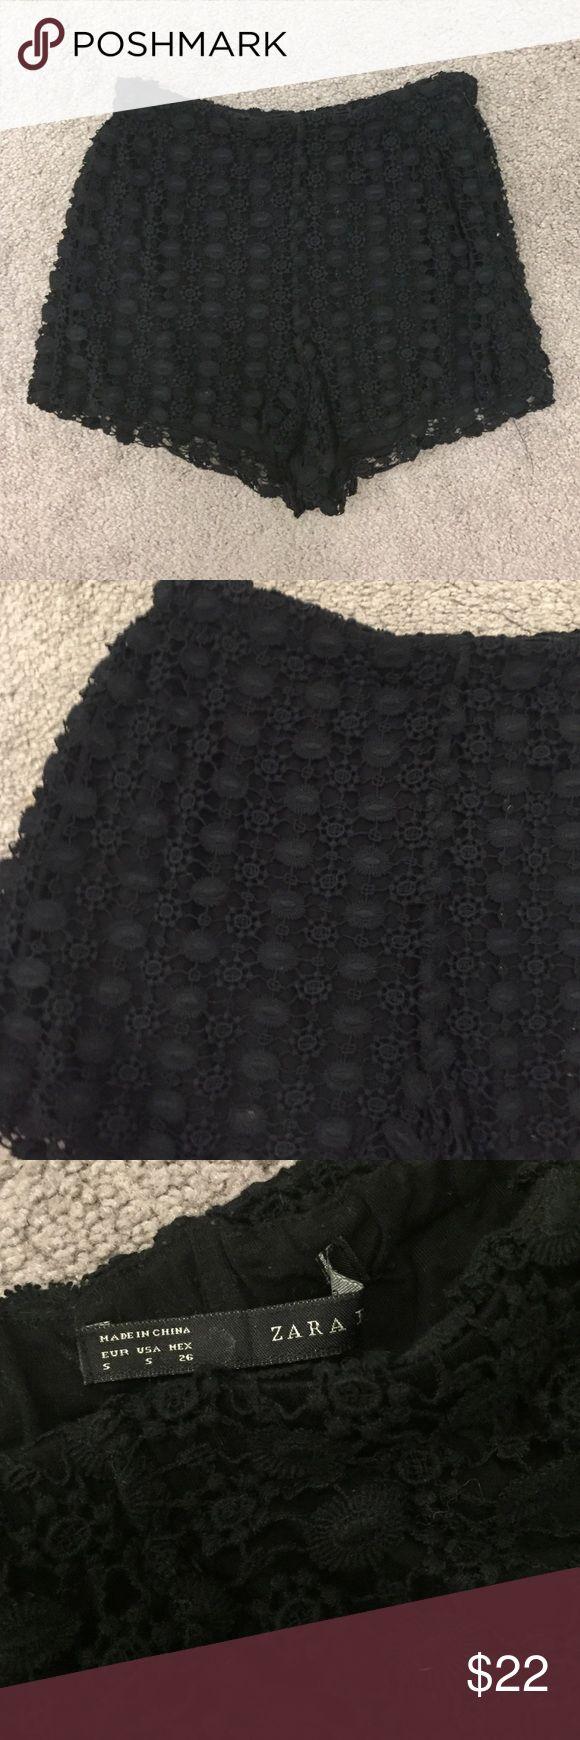 Zara Black Crocheted Shorts Black crochet shorts by ZARA - Elastic waistband, hidden side zipper. Super comfy & versatile. 100% cotton. Good condition. No trades! Zara Shorts